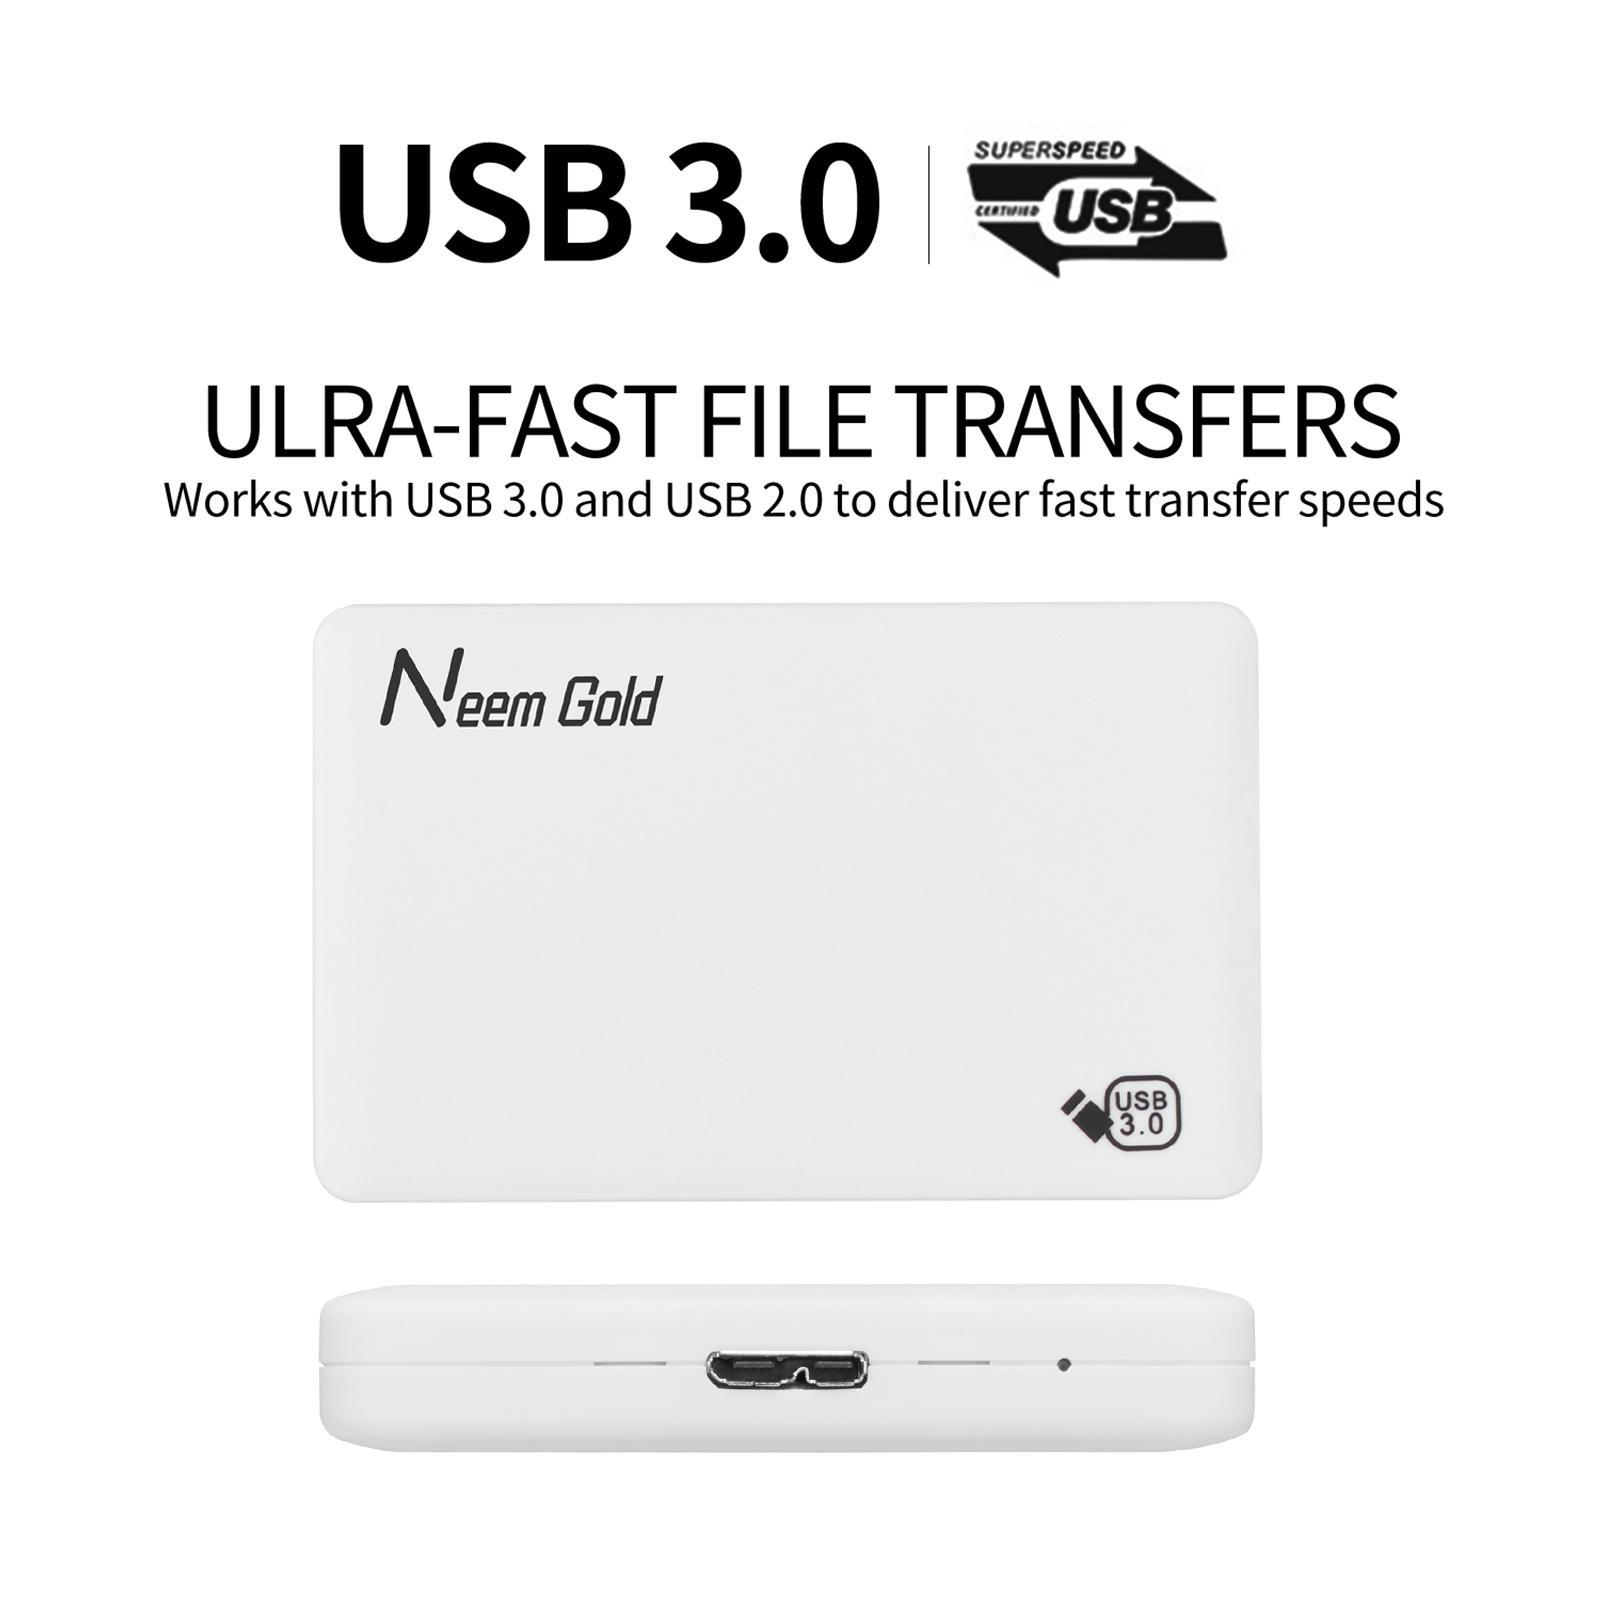 miniature 15 - ABS External Portable USB 3.0 Hard Drive Disk HDD for Desktop Laptop New